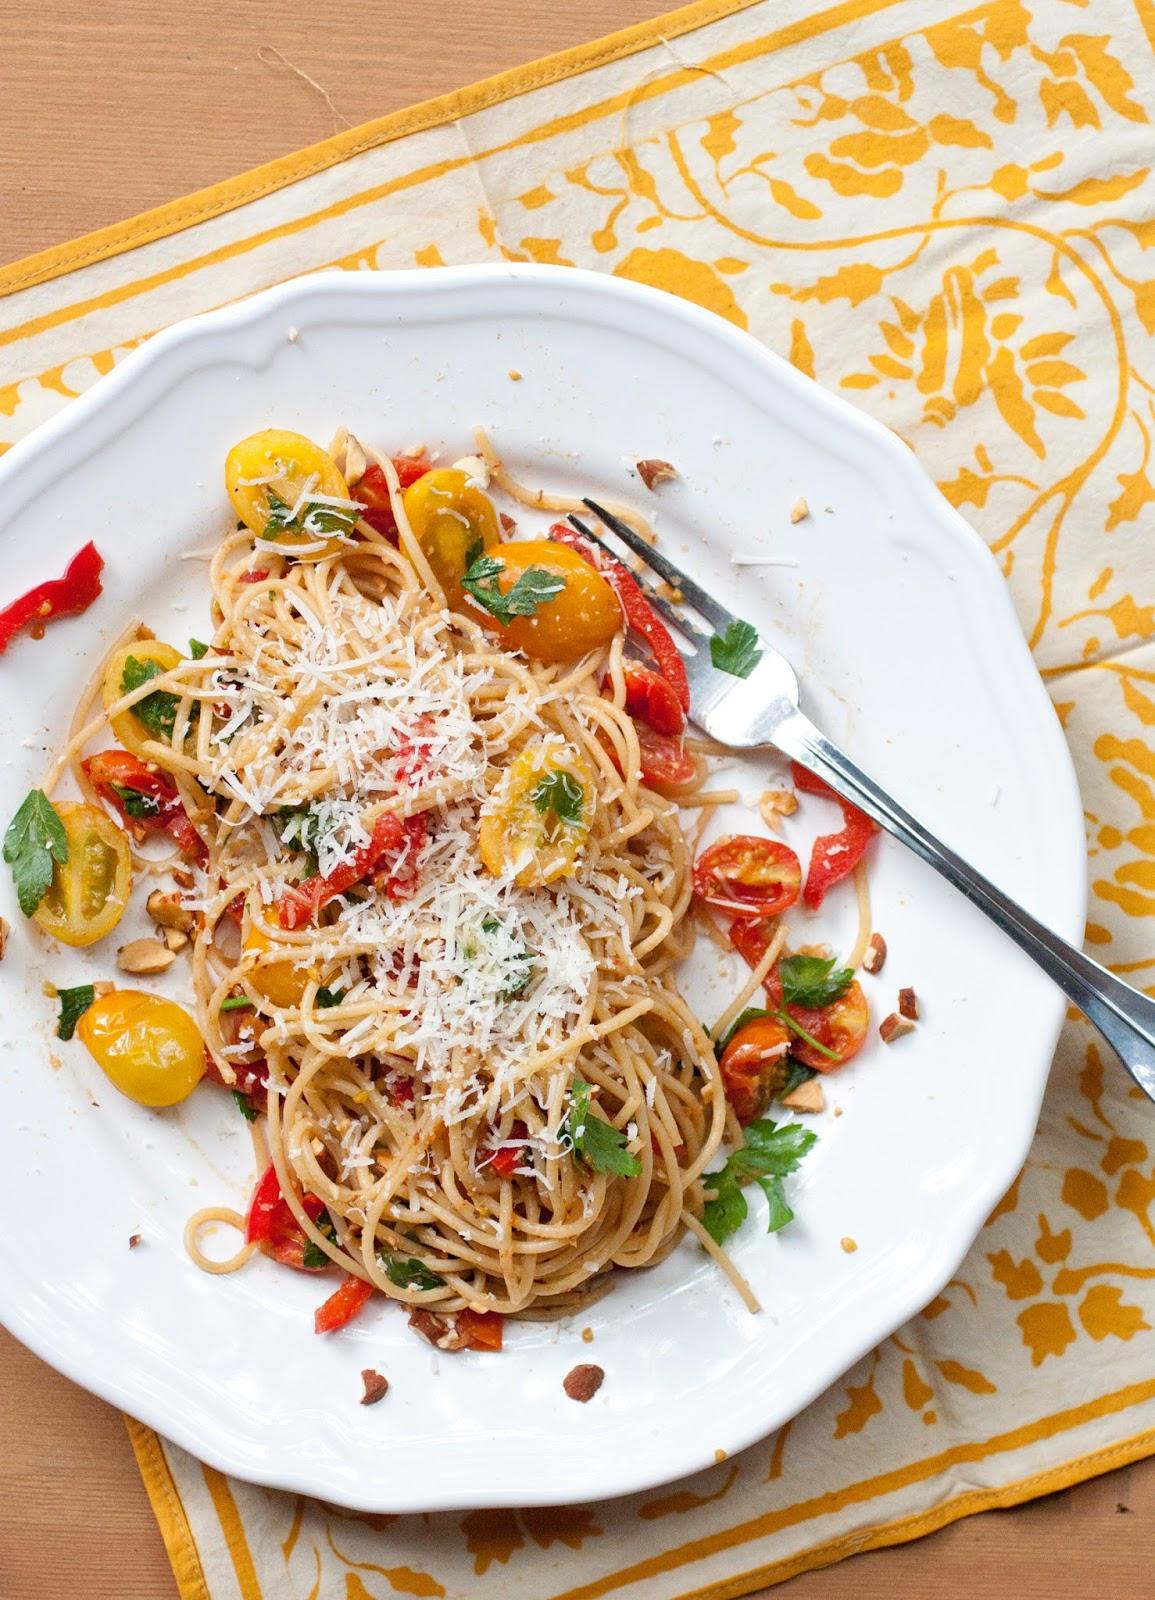 Tomato-Anchovy-Pasta-3.jpg